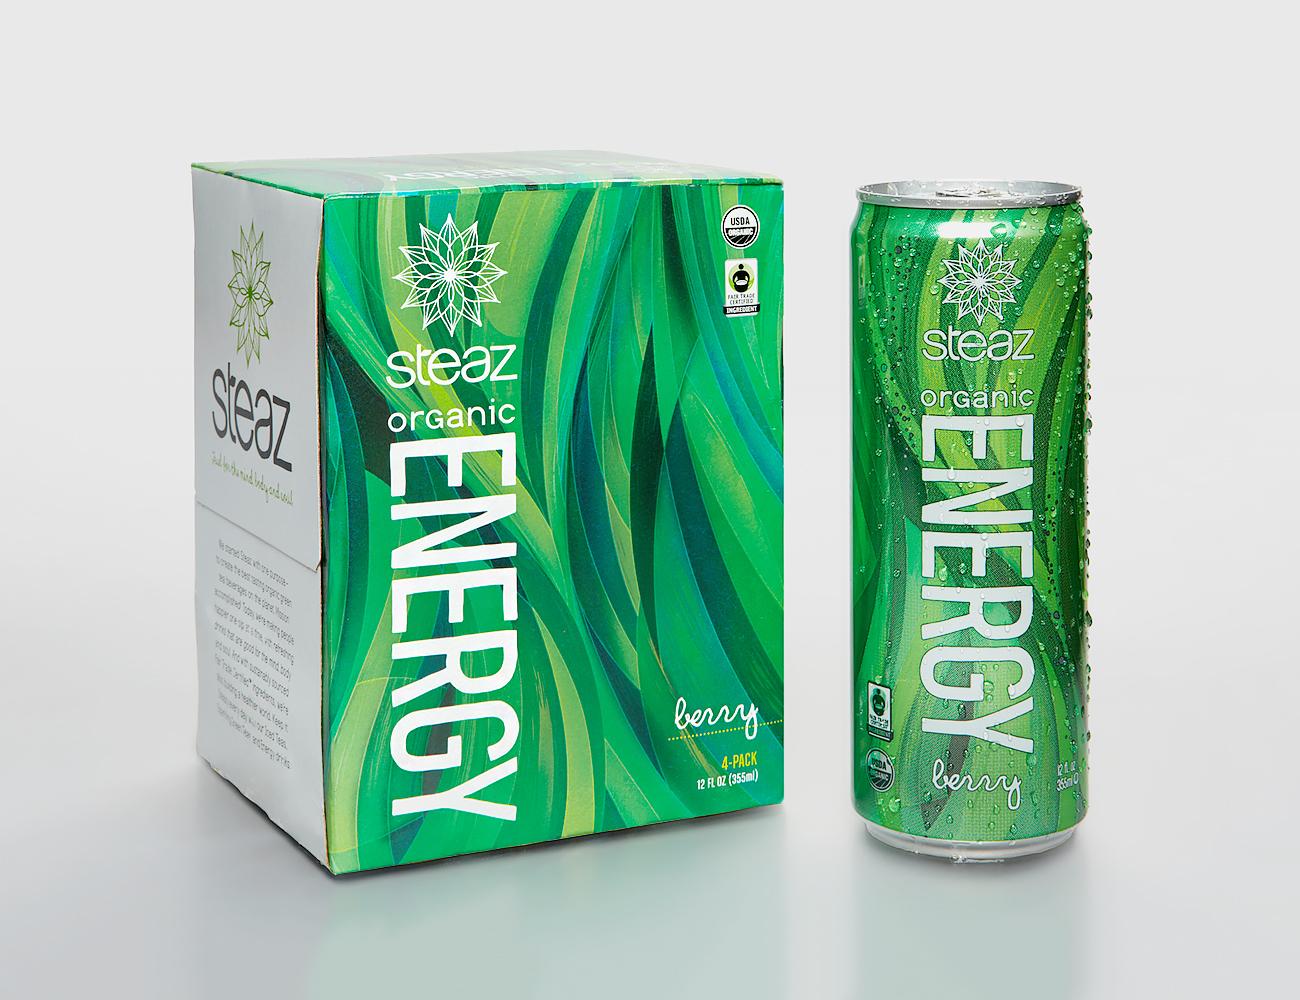 Steaz_Energy_BerryCanBox_lighter_2.jpg